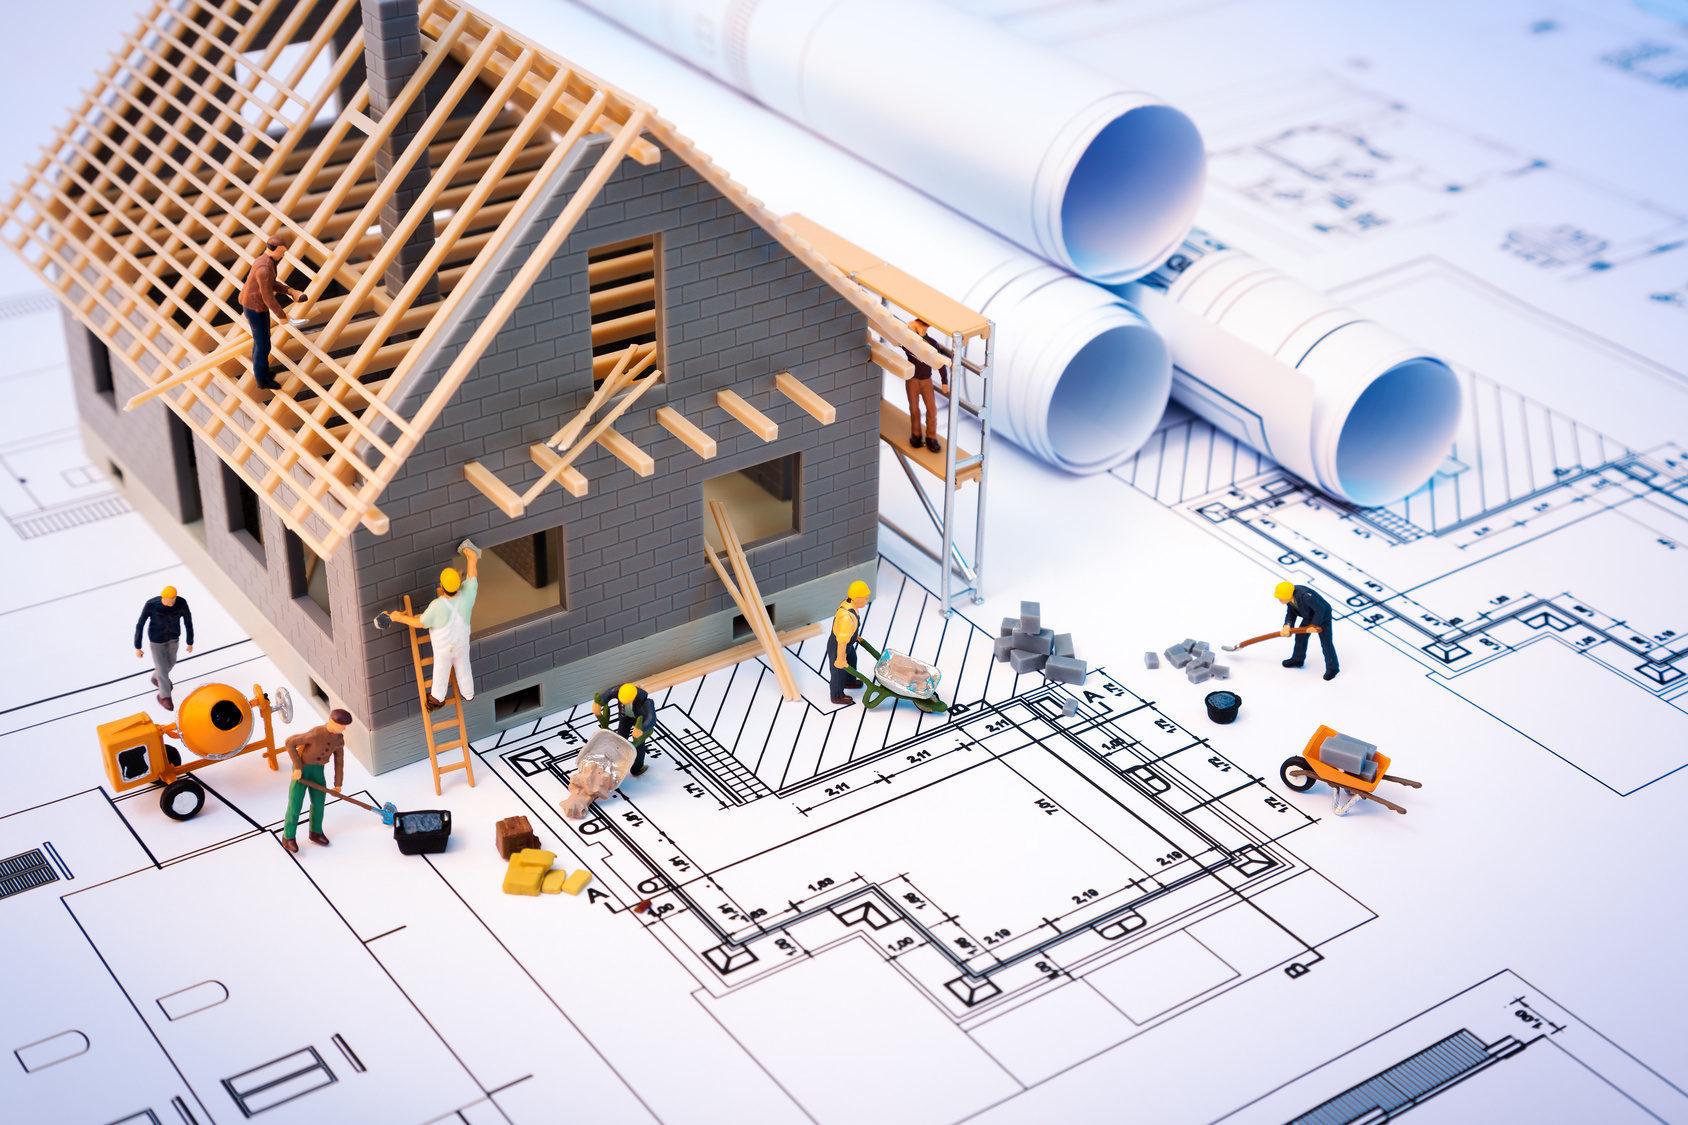 Home_Construction__Romolo_Tavani_-_Fotolia